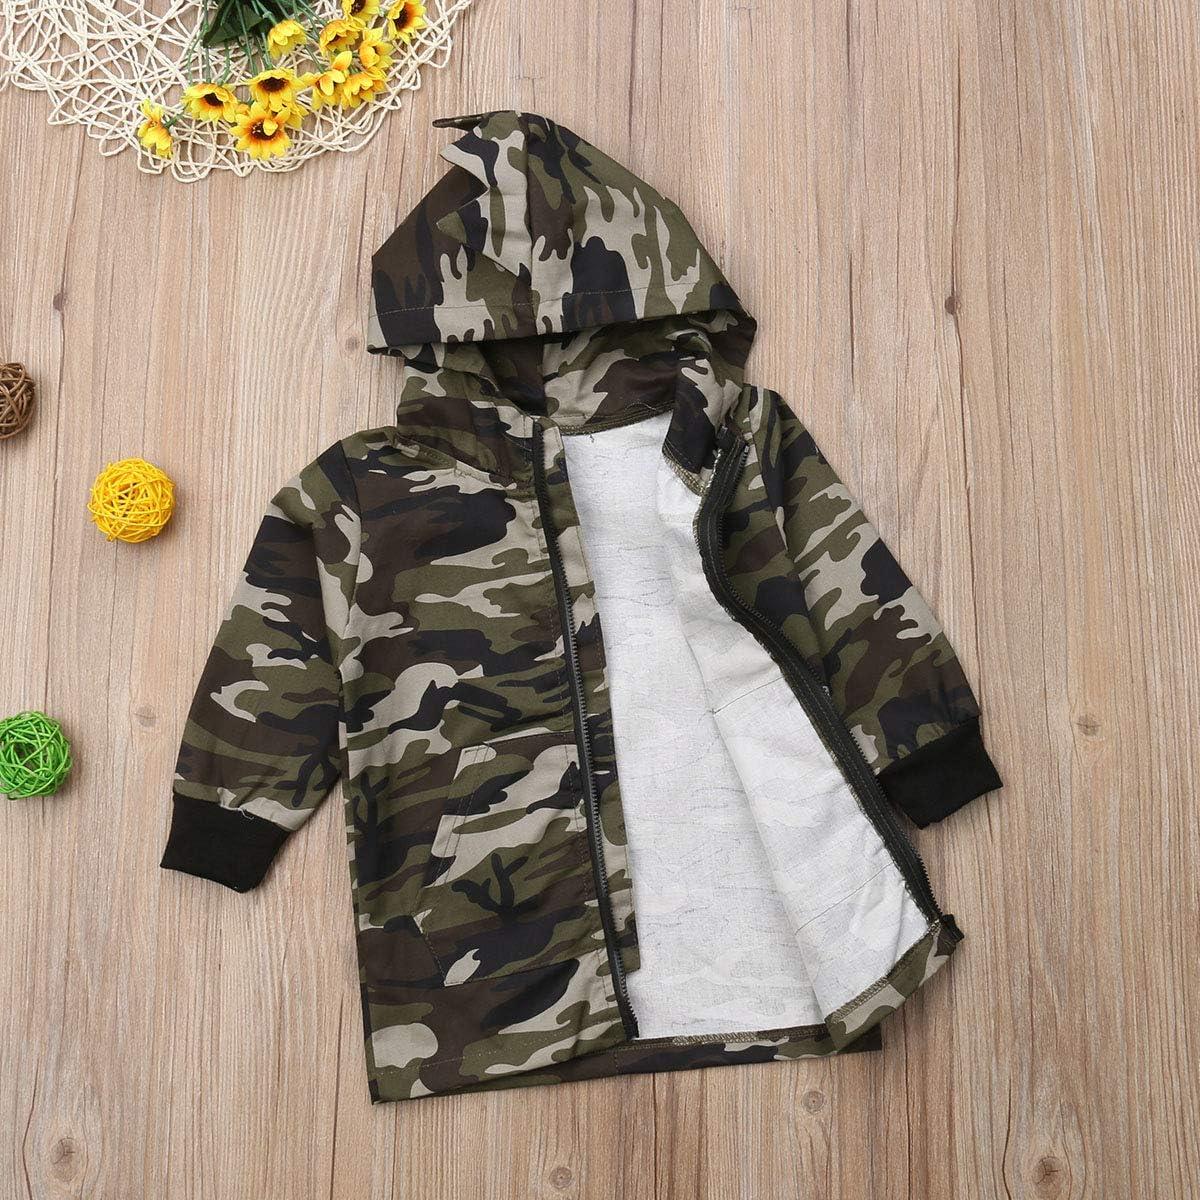 JUBILATE Toddler Baby Boys Casual Long Sleeve Camouflage Dinosaur Zipper Jacket Coat Hoodies